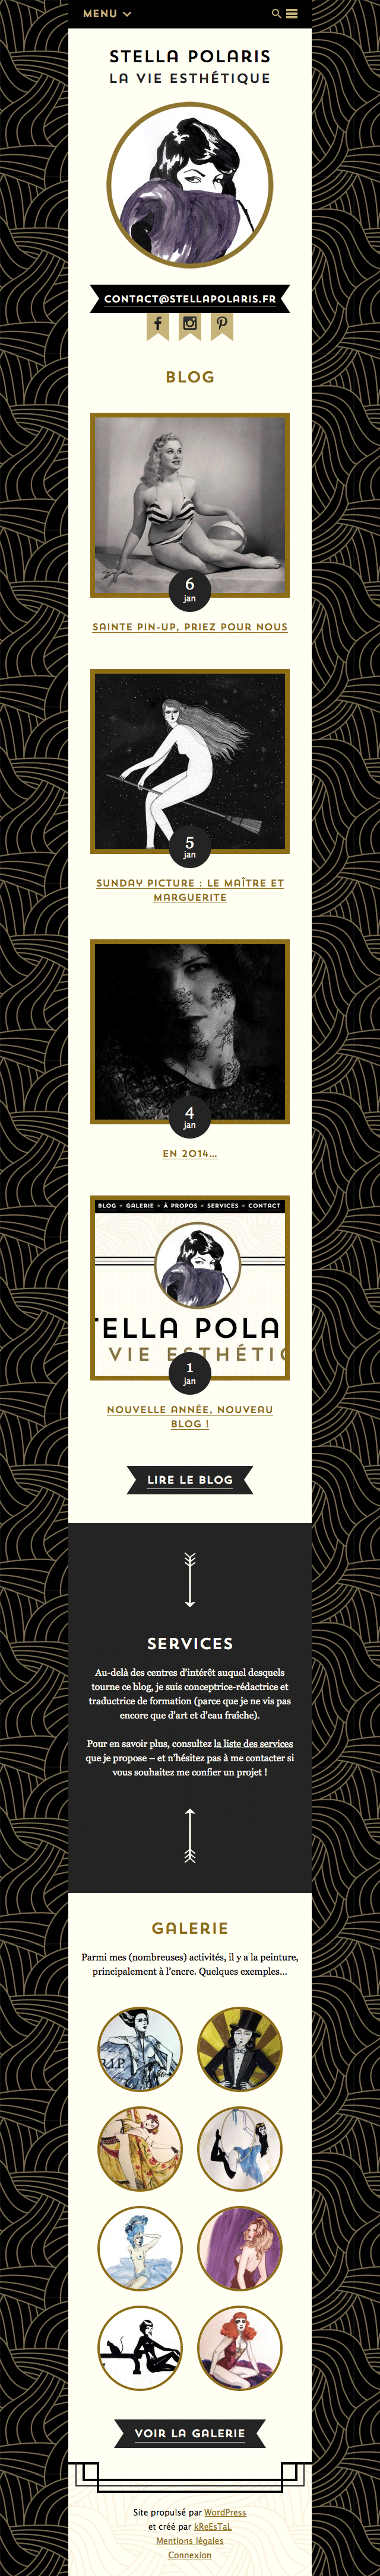 Stella Polaris : page d'accueil mobile